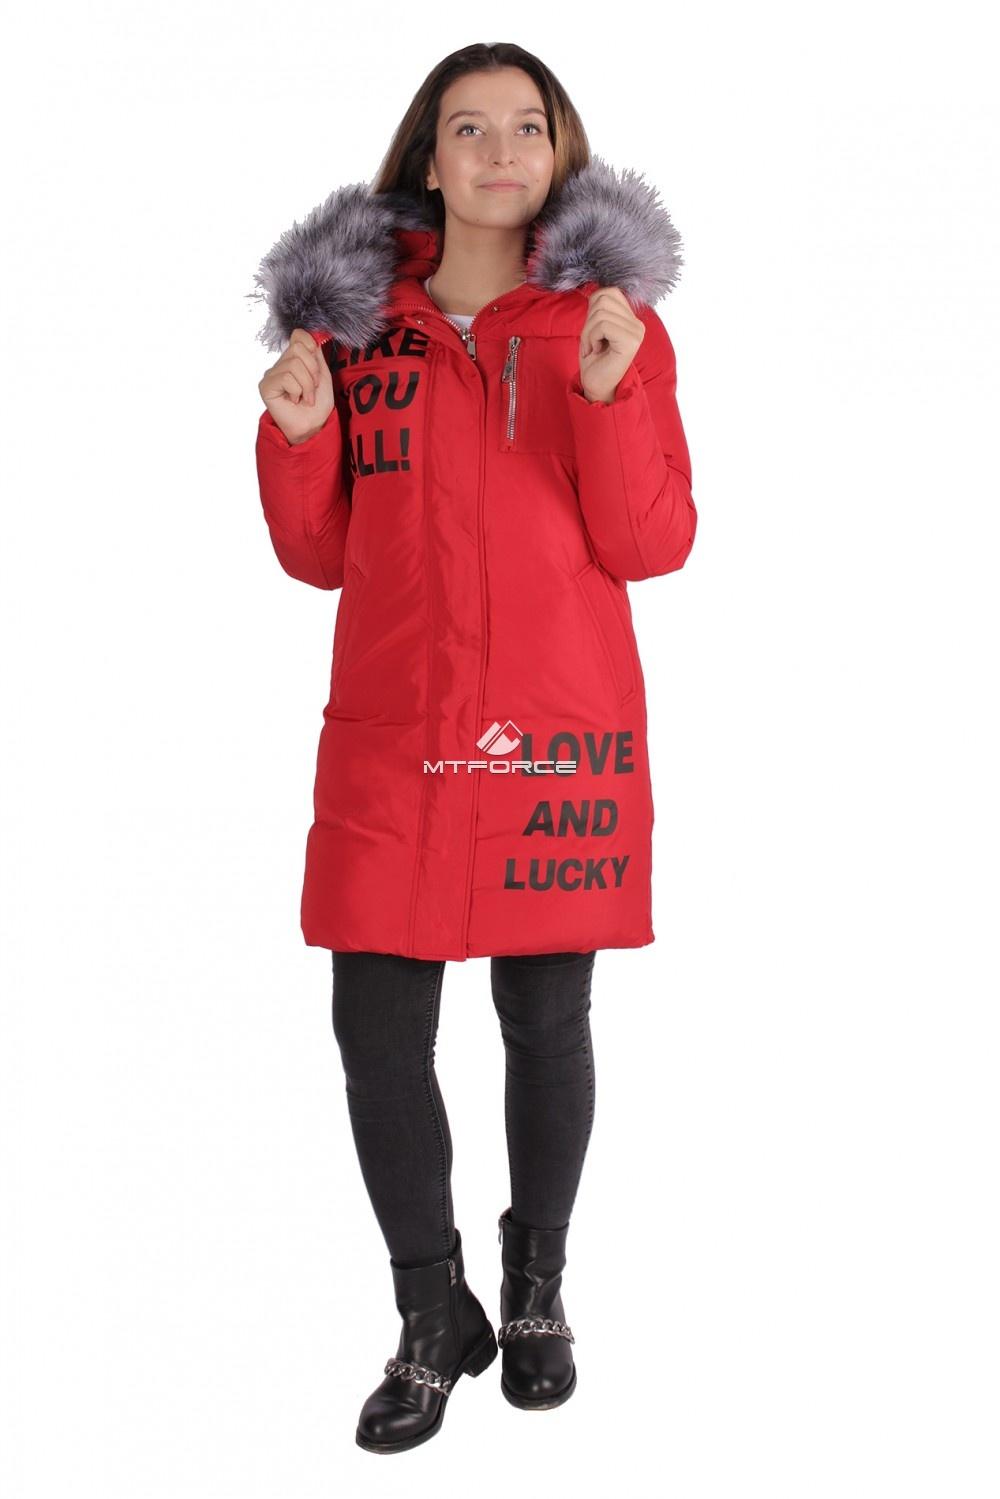 Купить оптом Пуховик ТРЕНД женский зимний красного цвета 16085Kr в Новосибирске